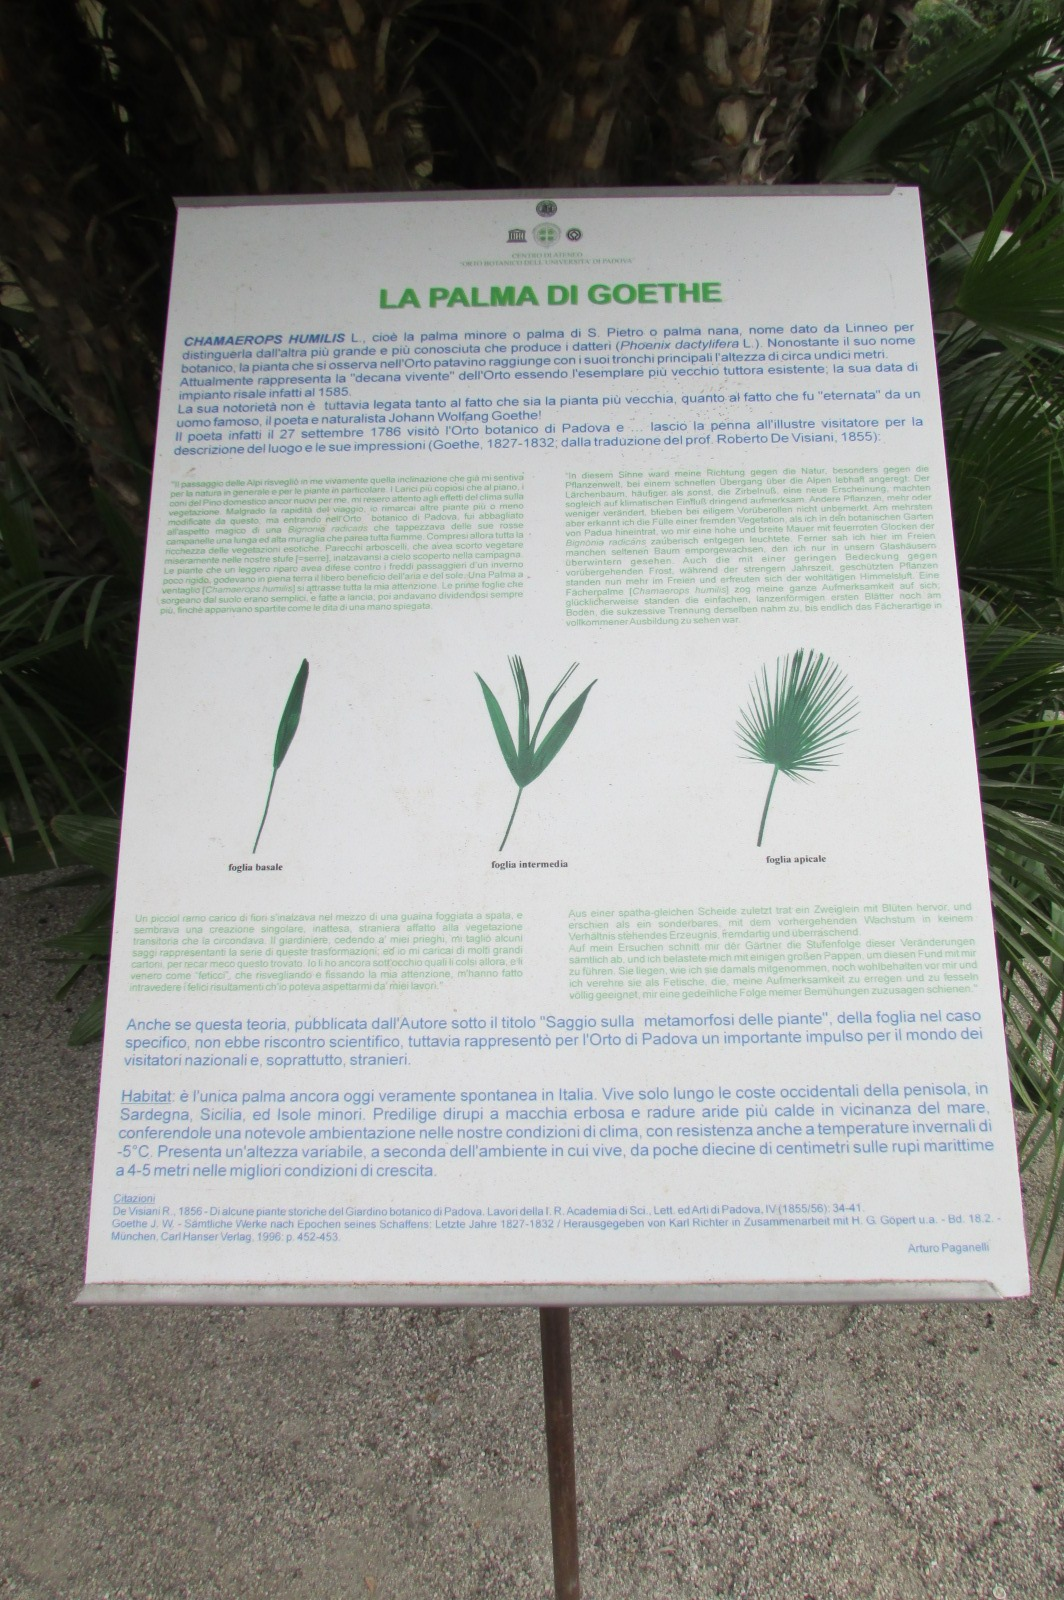 File:7 (VII) Palma Di Goethe 10-07 to 22 1427.jpg ...